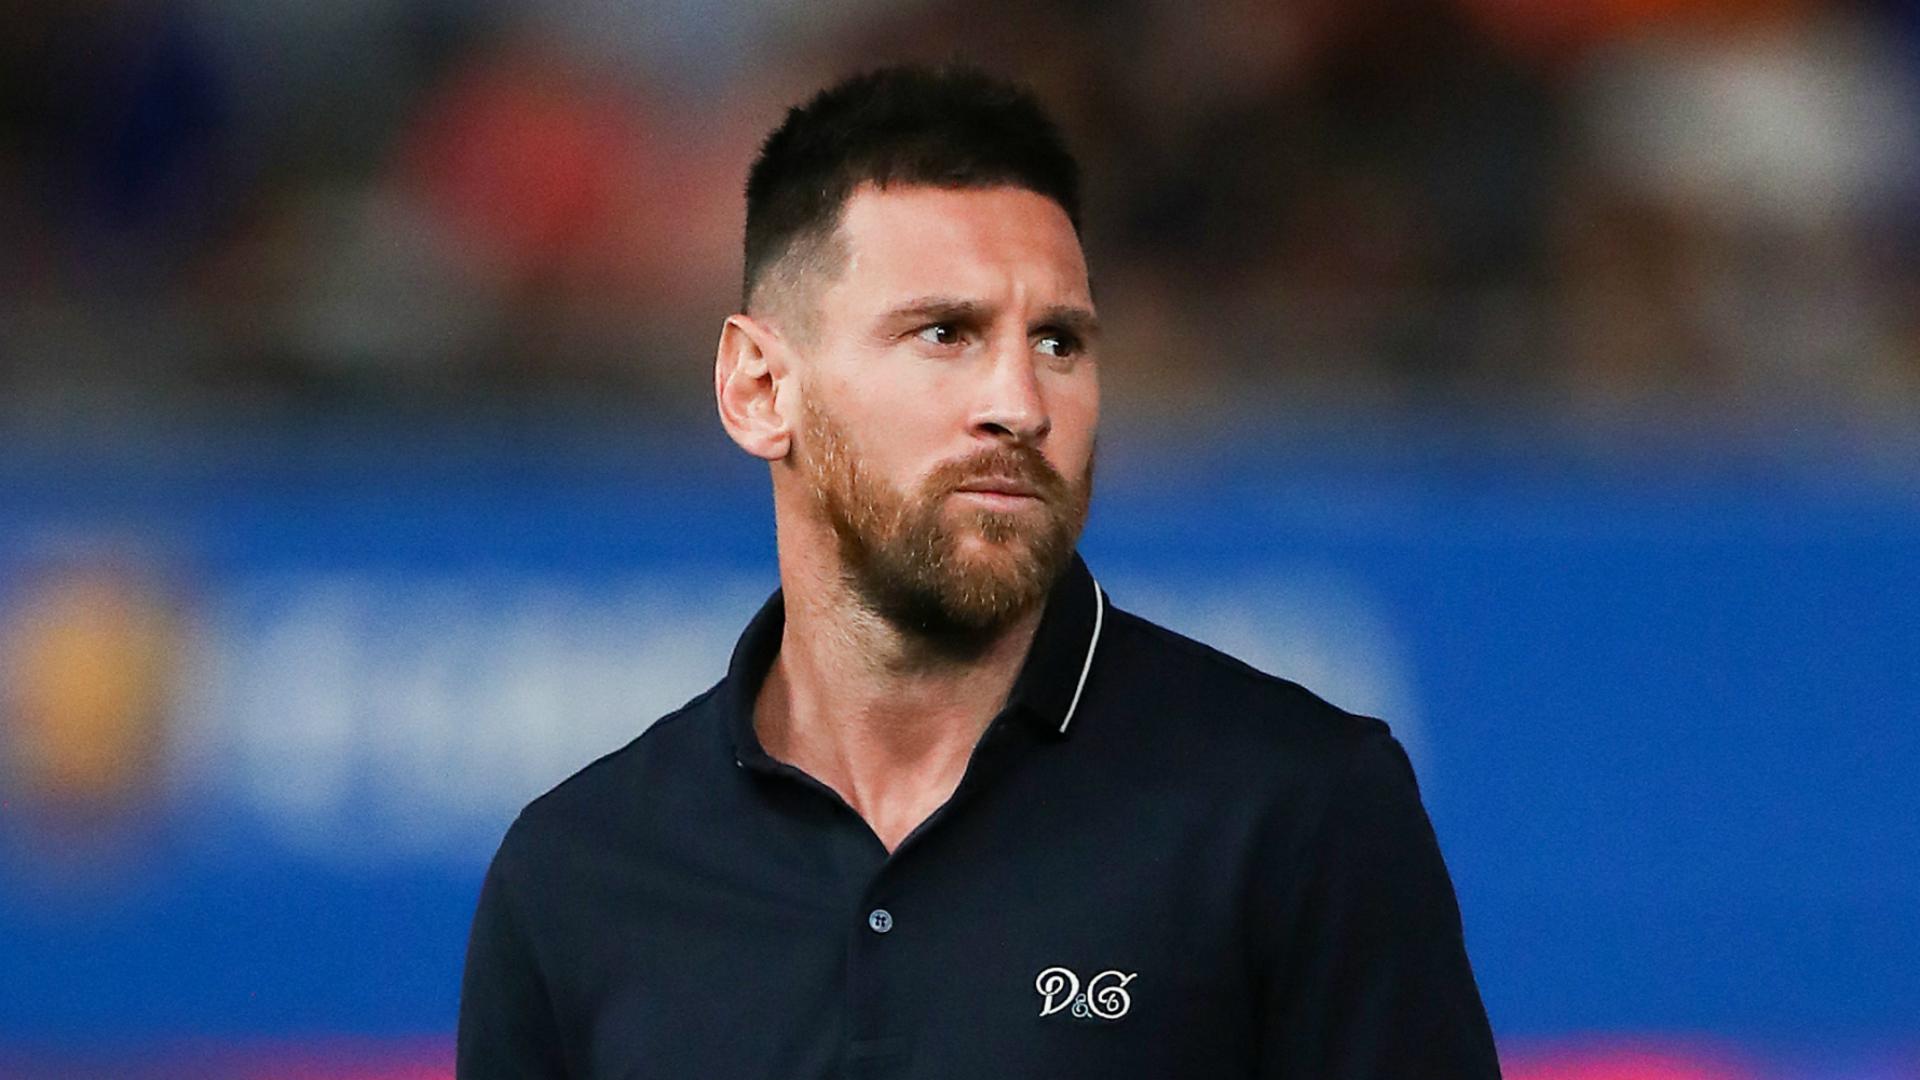 Lionel Messi returns to Barca squad for Dortmund trip